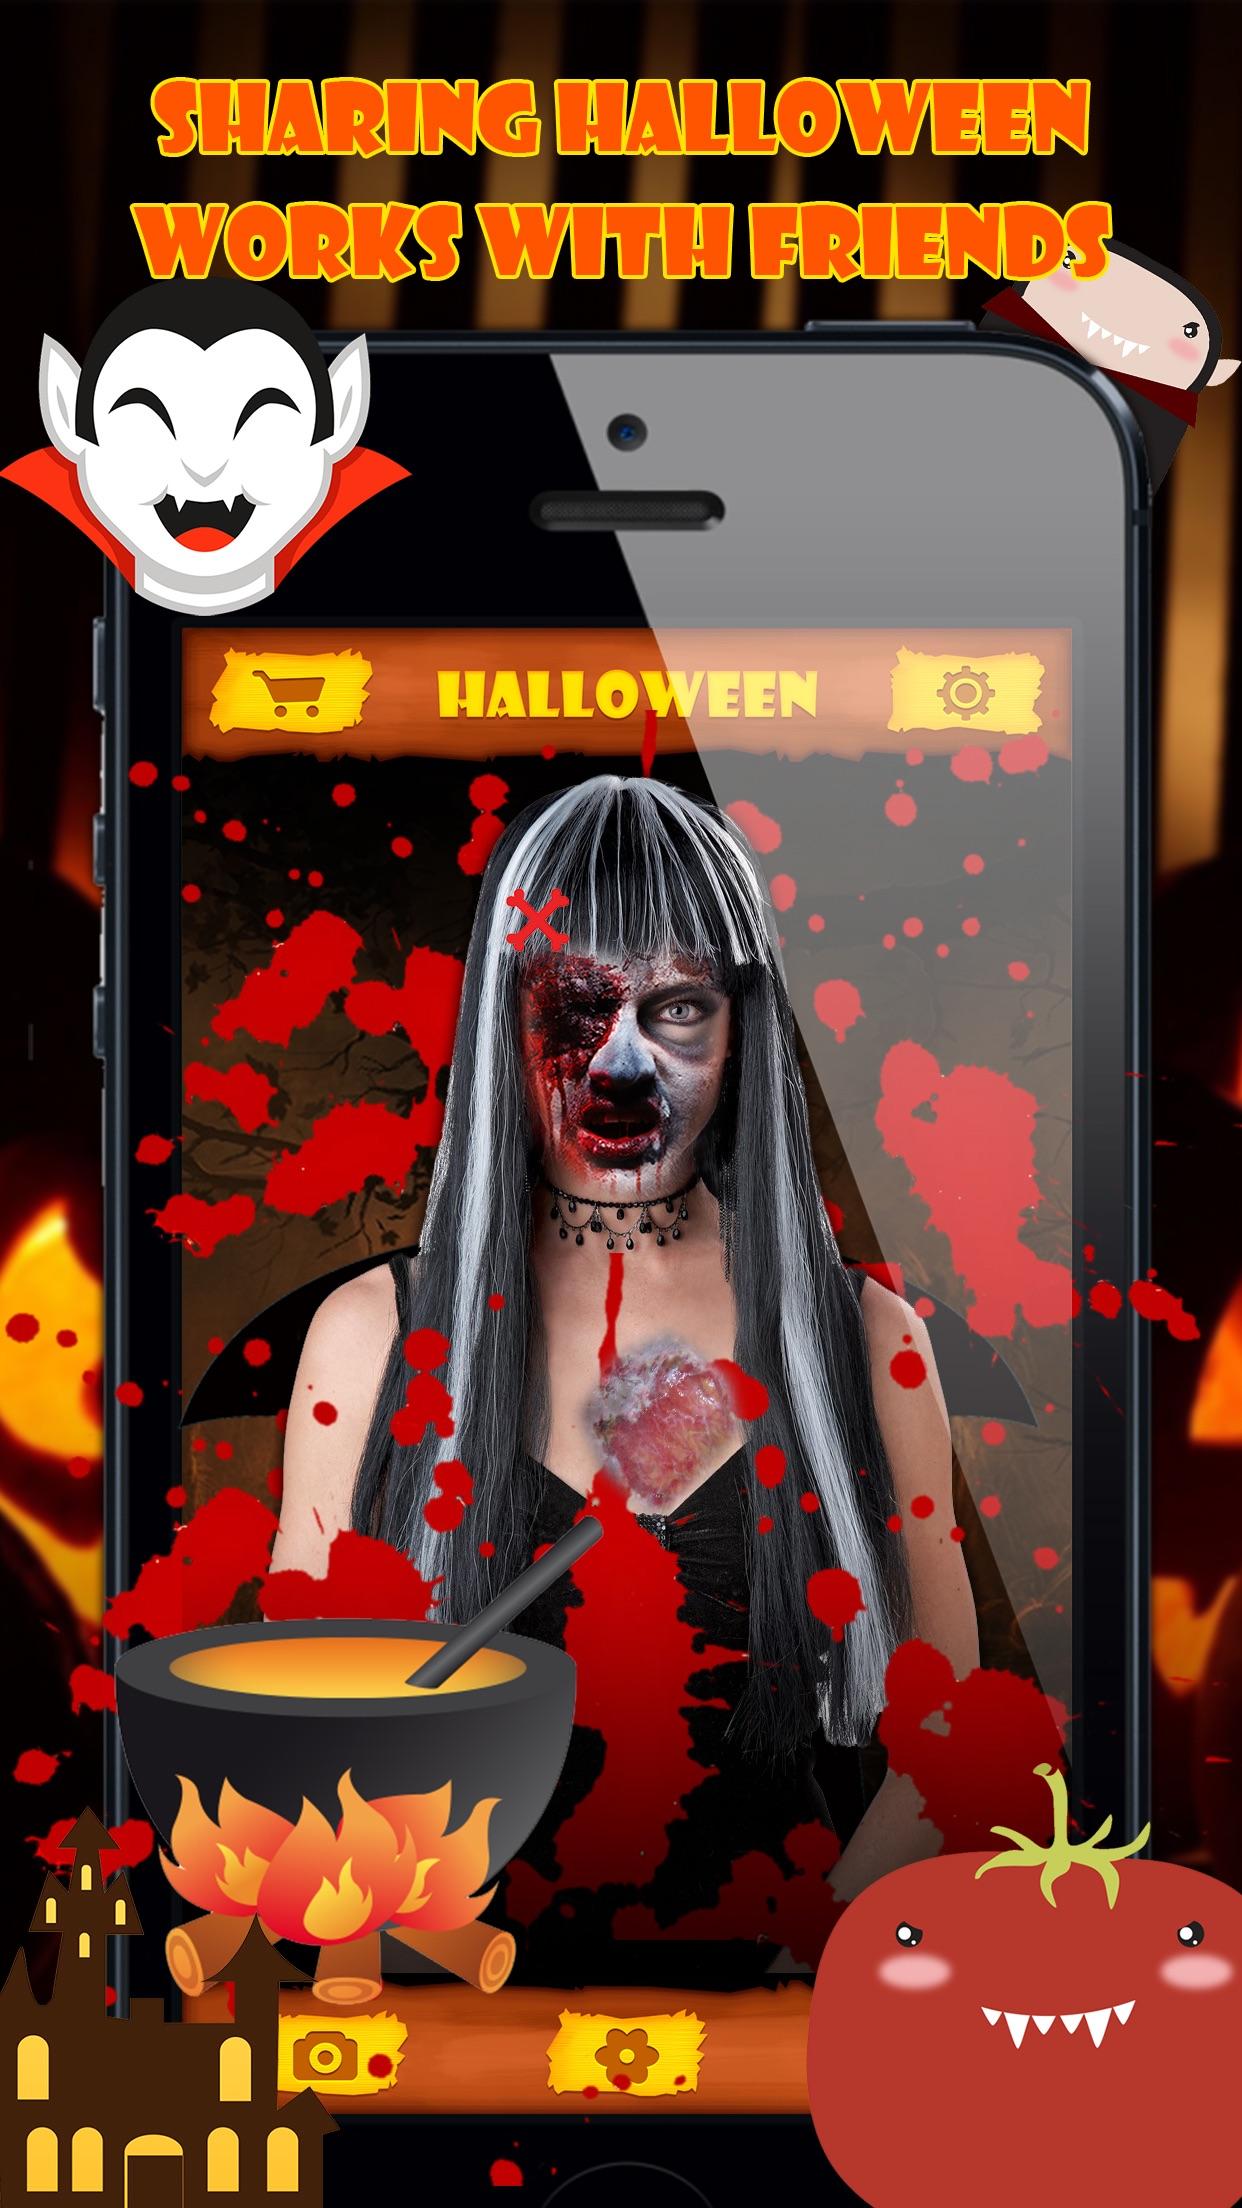 Halloween Emoji Stickers - Face Photo Makeup Games Screenshot